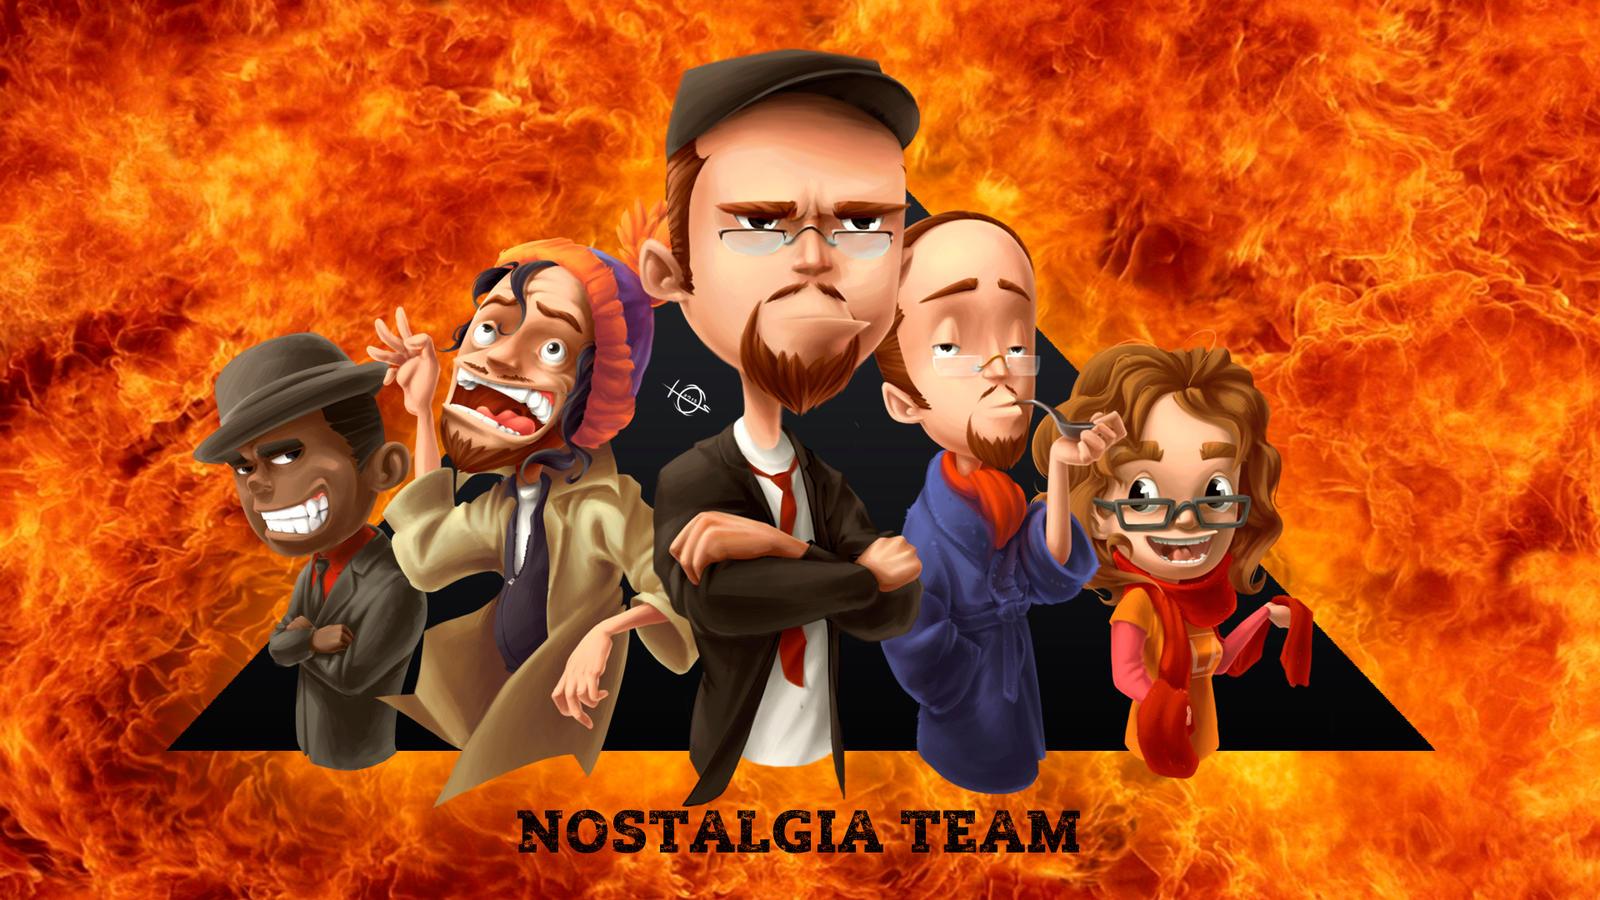 Nostalgia Team by Jorn-Siberian